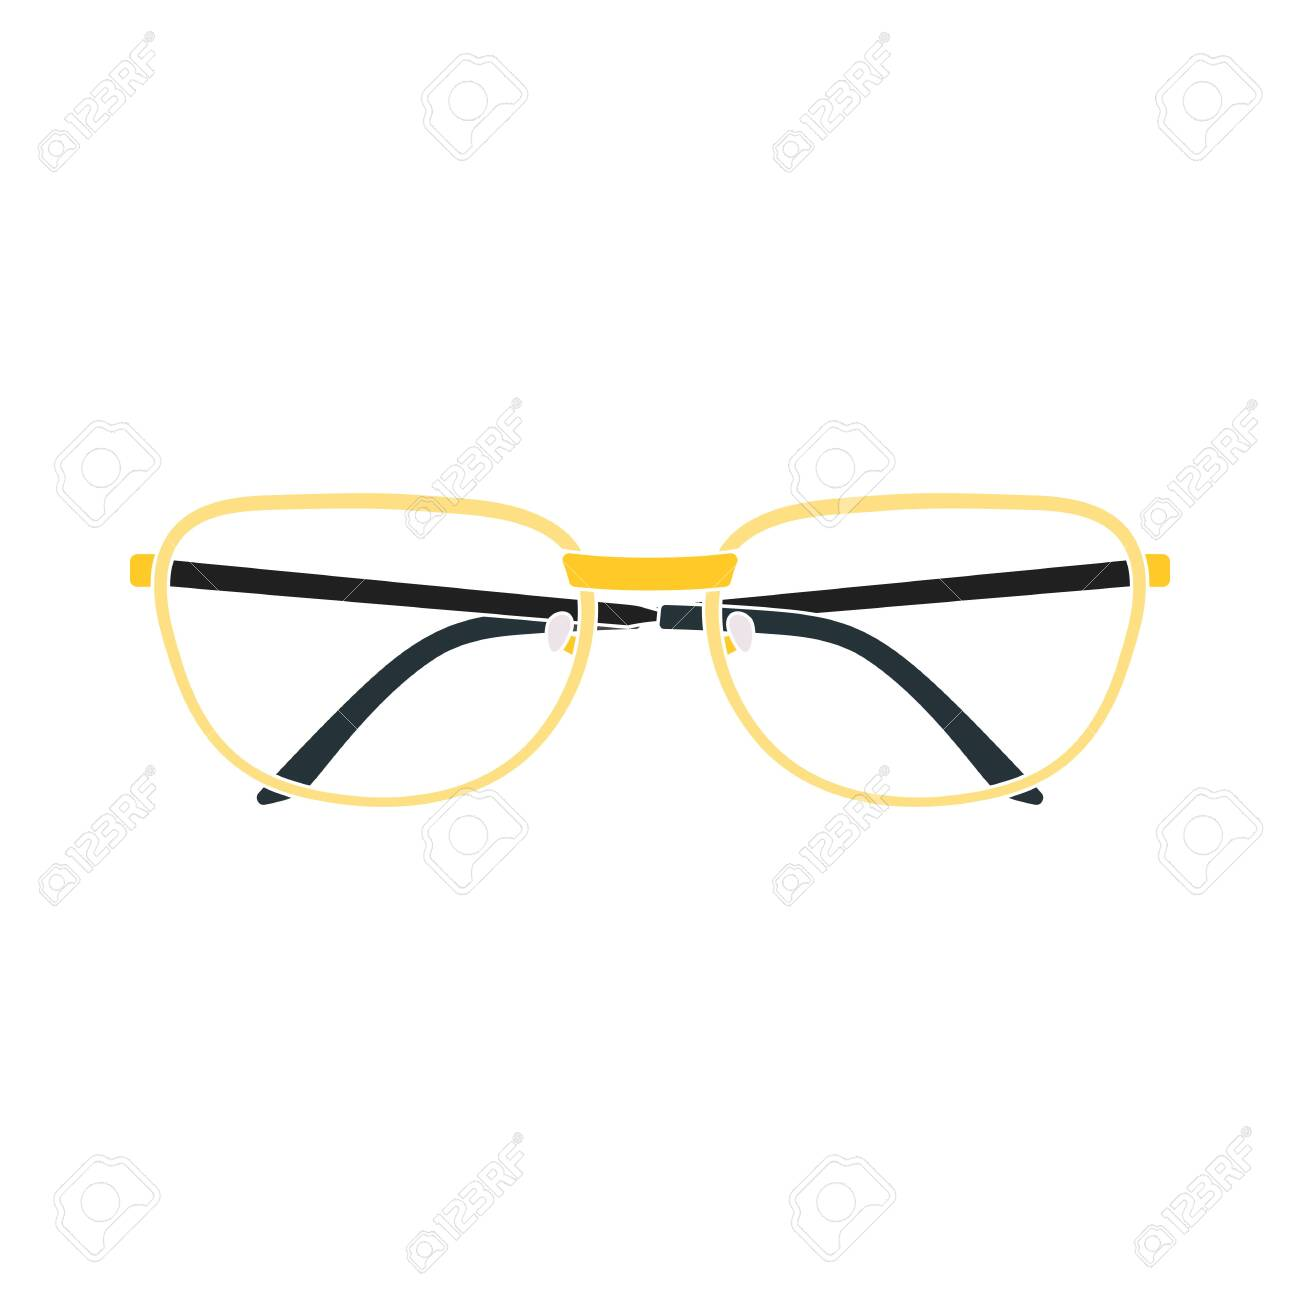 Glasses Icon. Flat Color Design. Vector Illustration. - 154502103